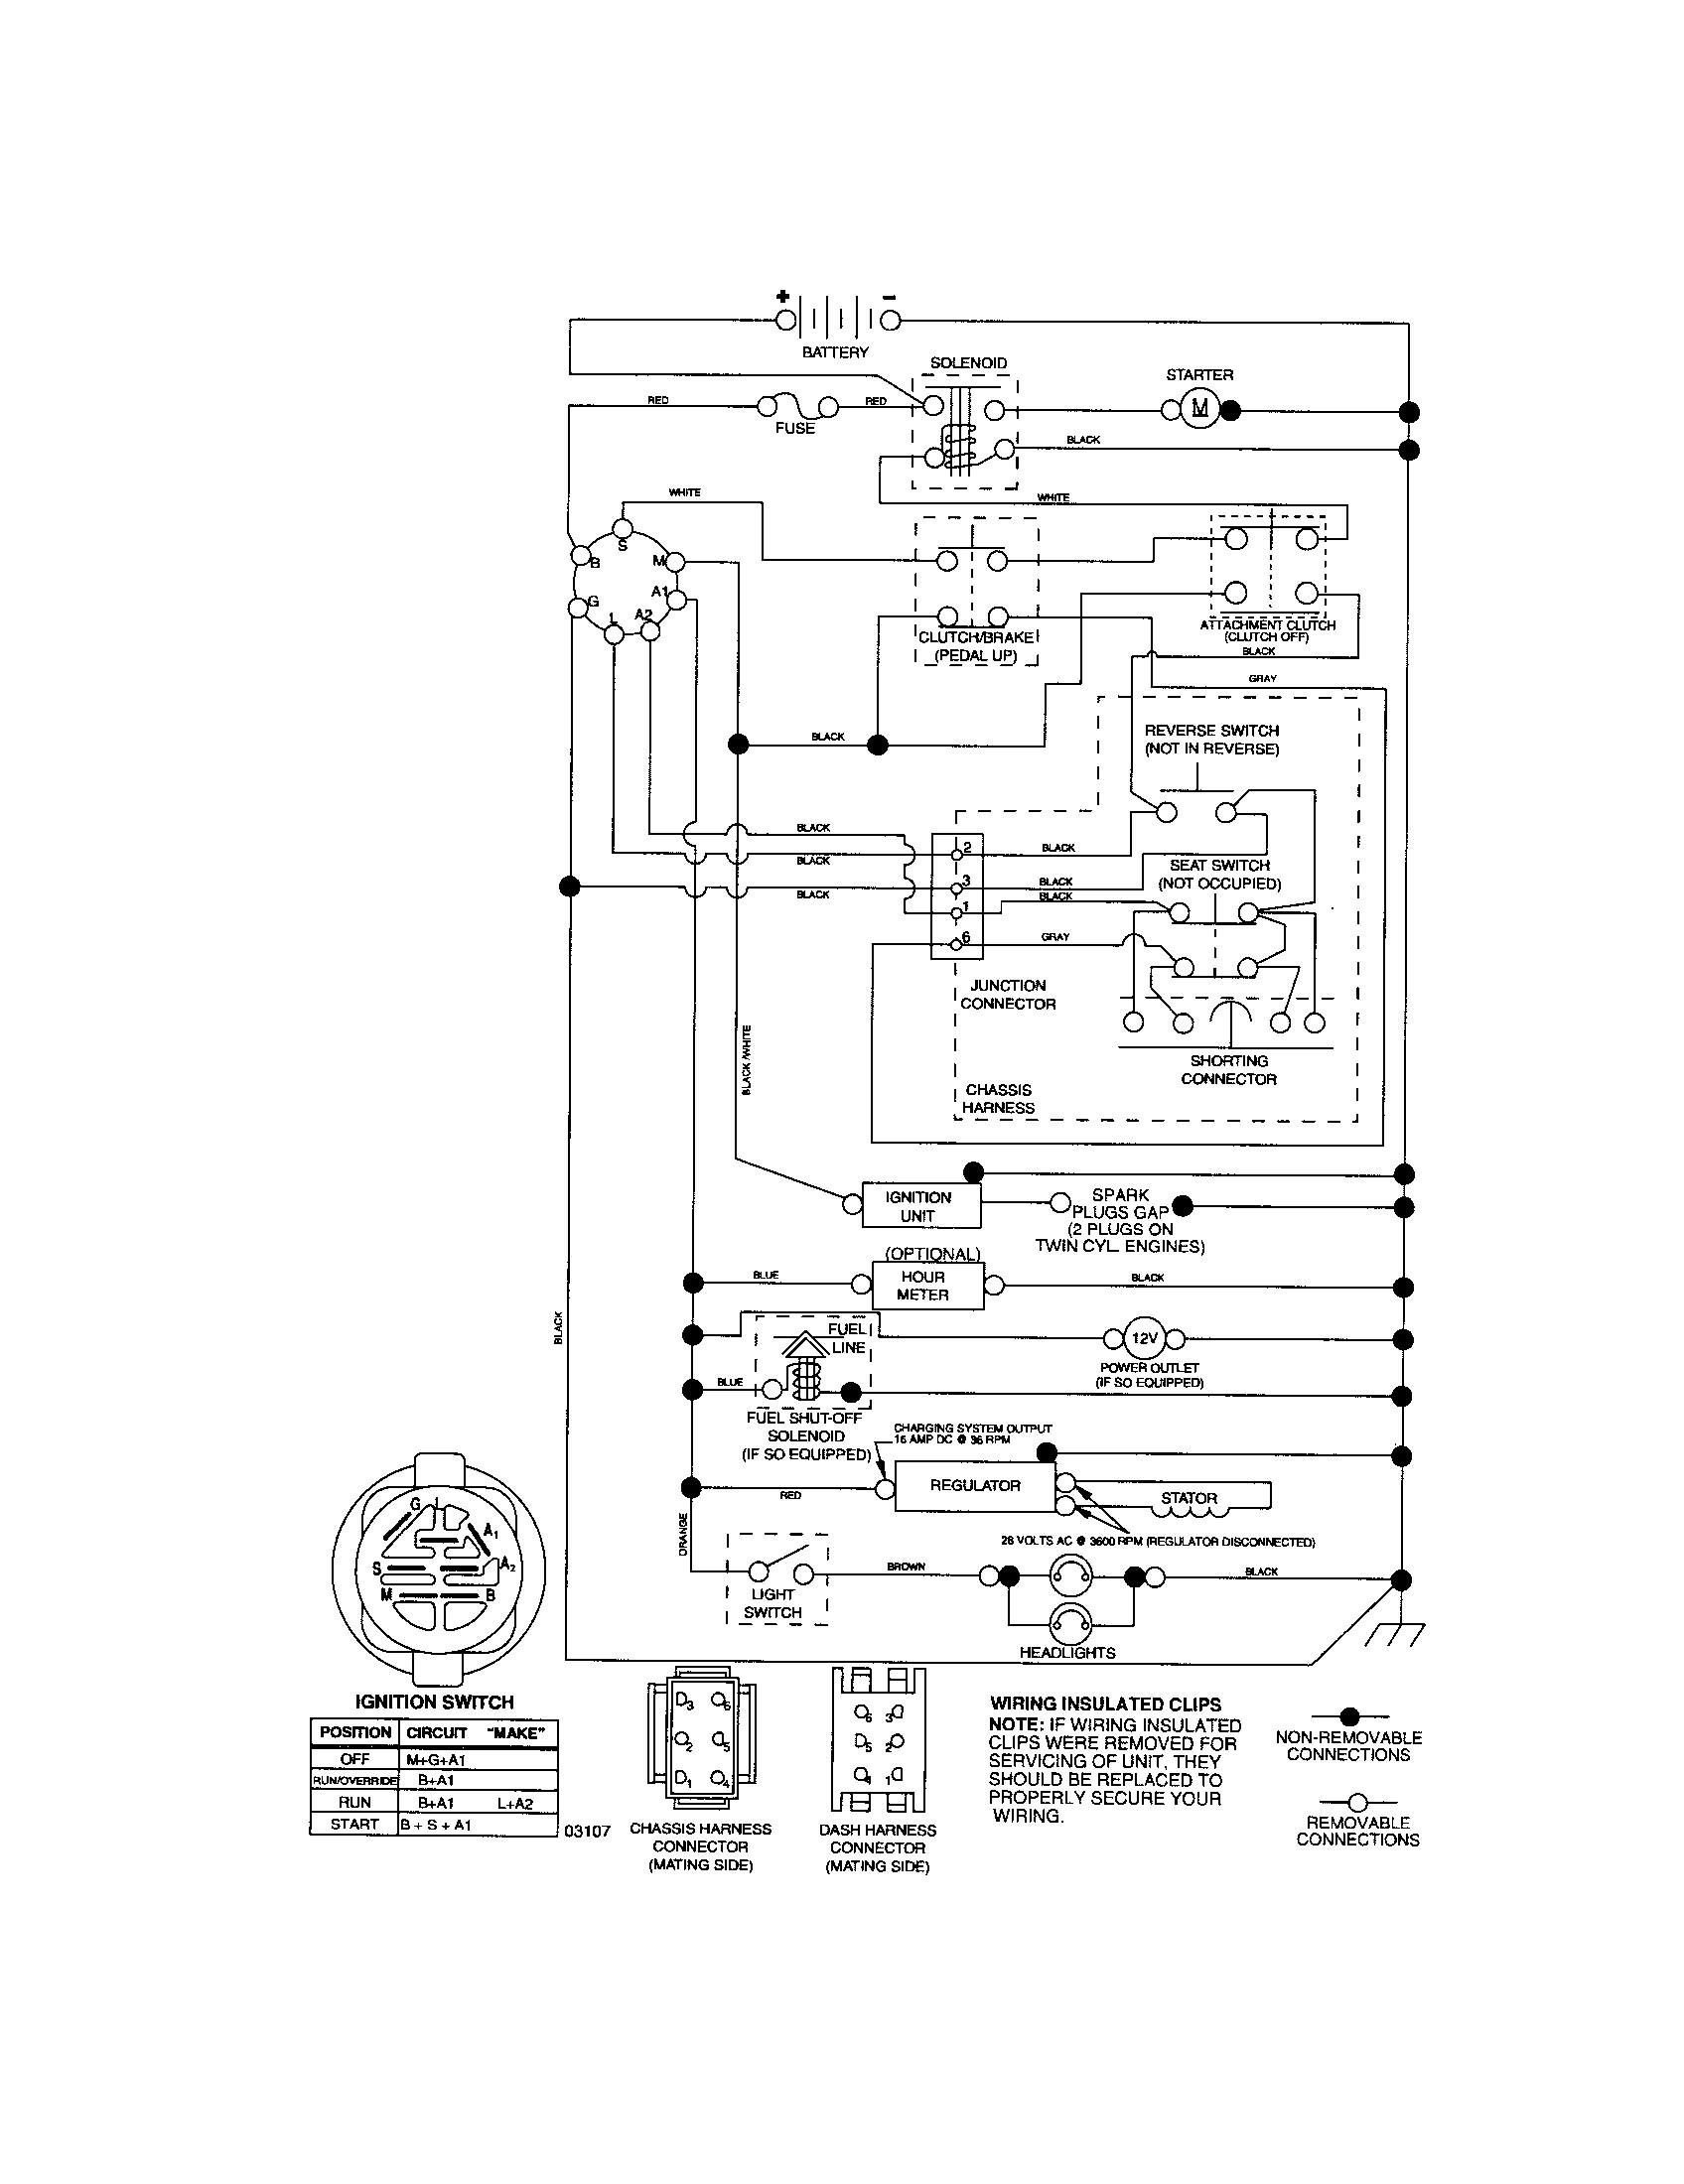 John Deere L120 Pto Clutch Wiring Diagram